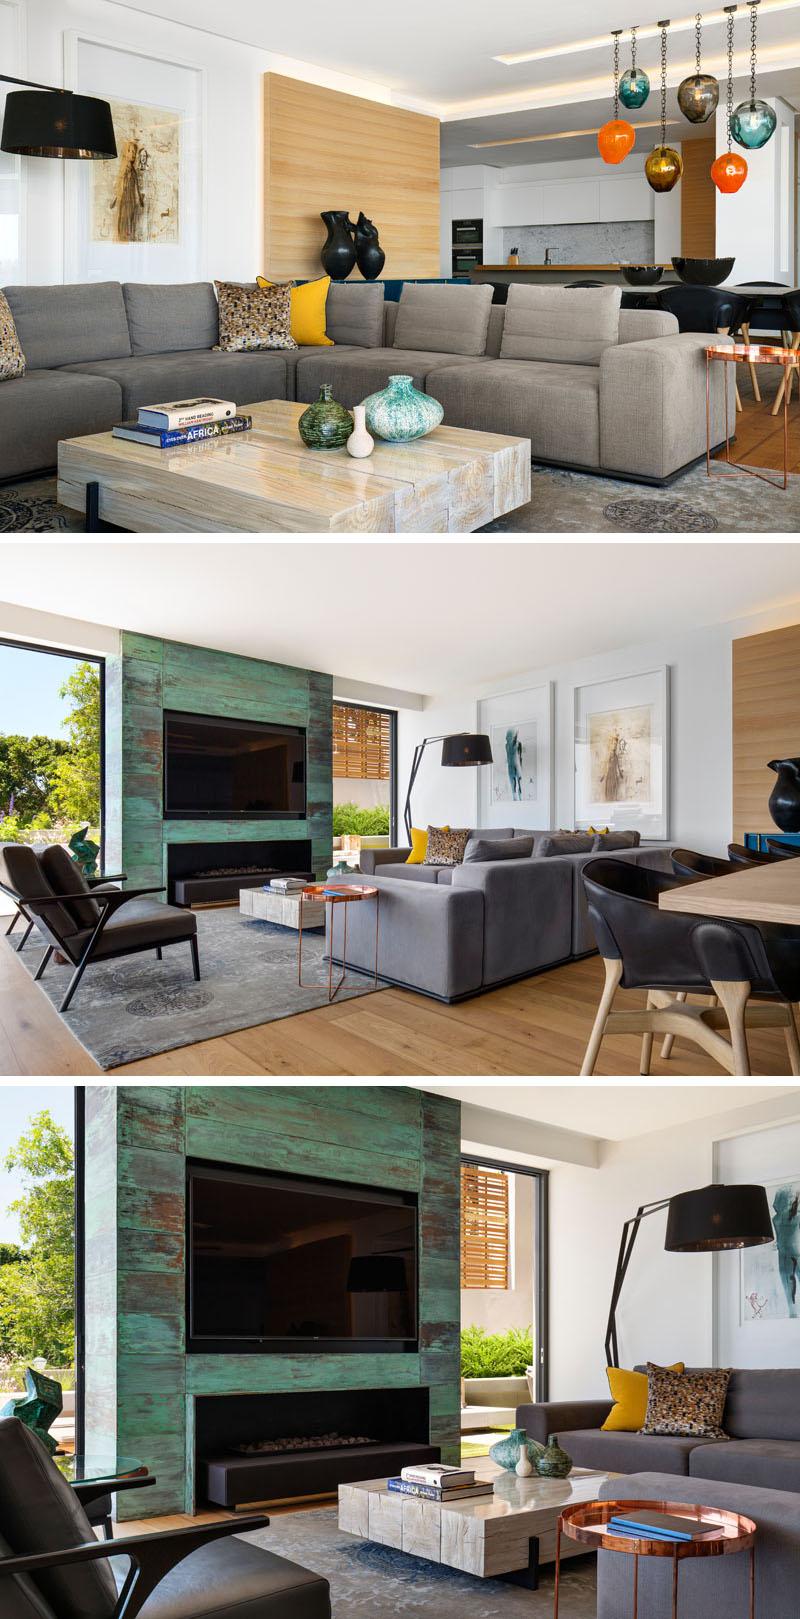 Un apartament amenajat printr-un amestec de materiale contemporane - Un apartament amenajat printr-un amestec de materiale